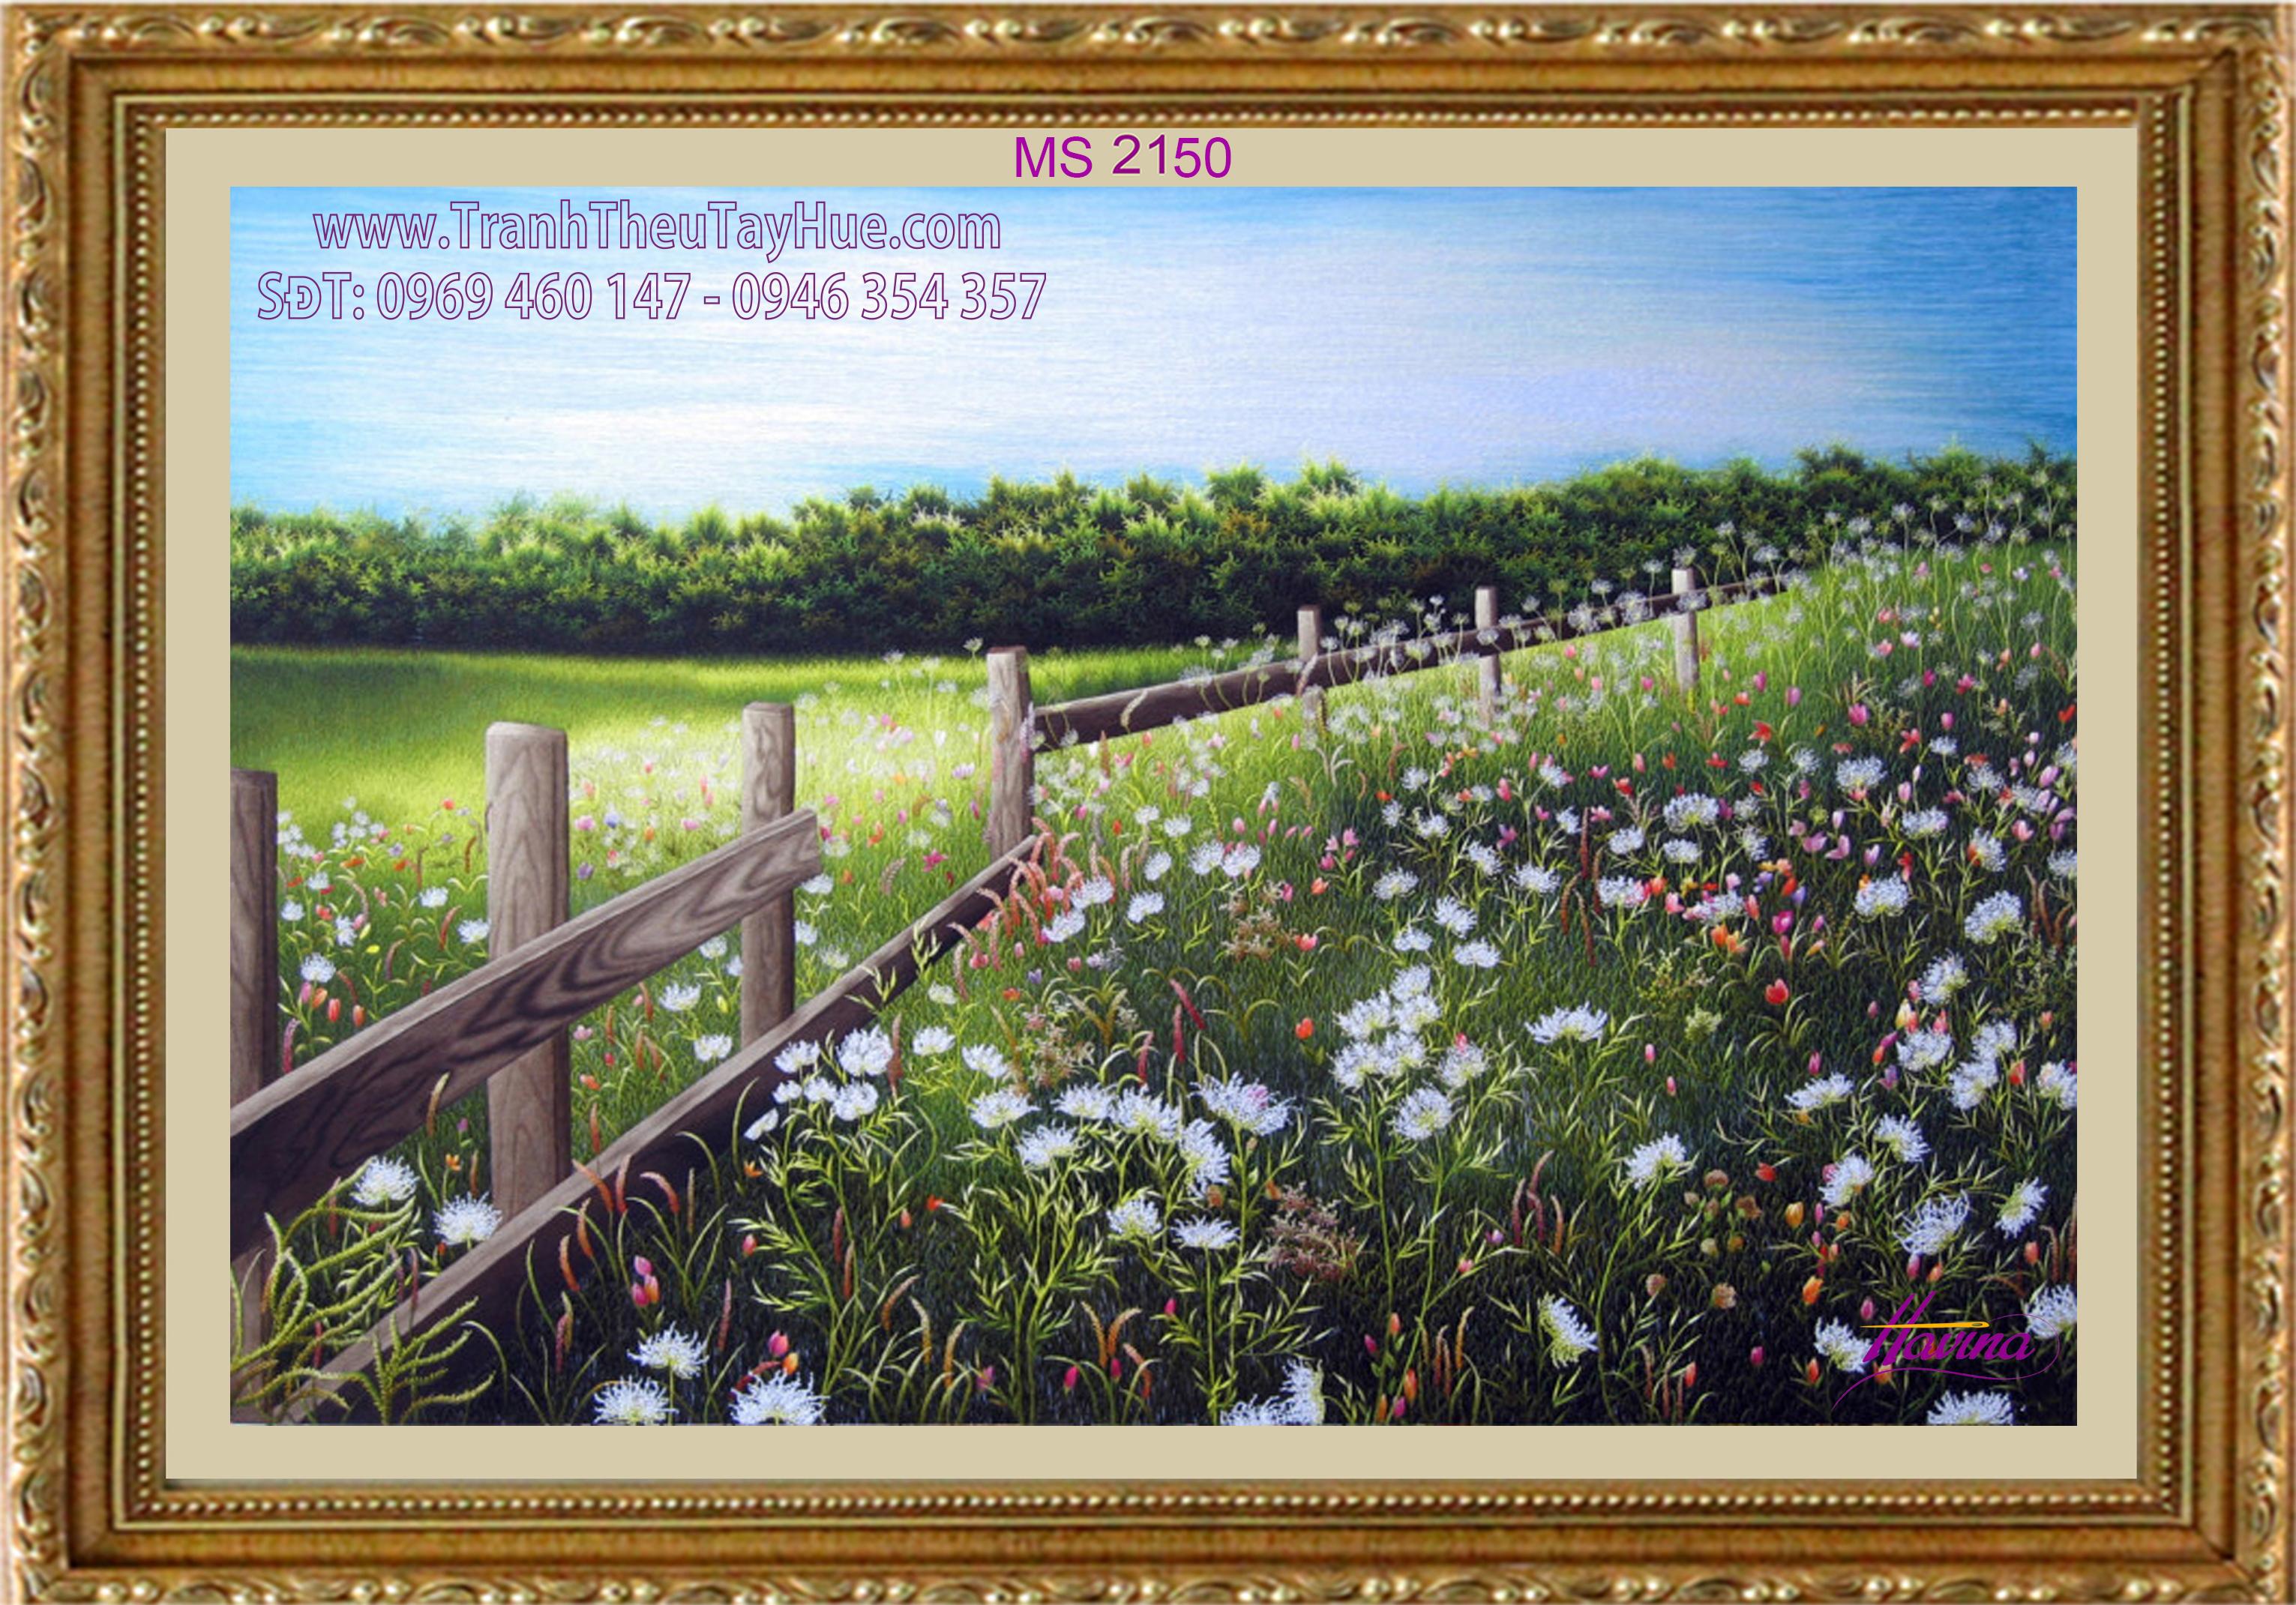 tranh-theu-phong-canh-lang-que-2150